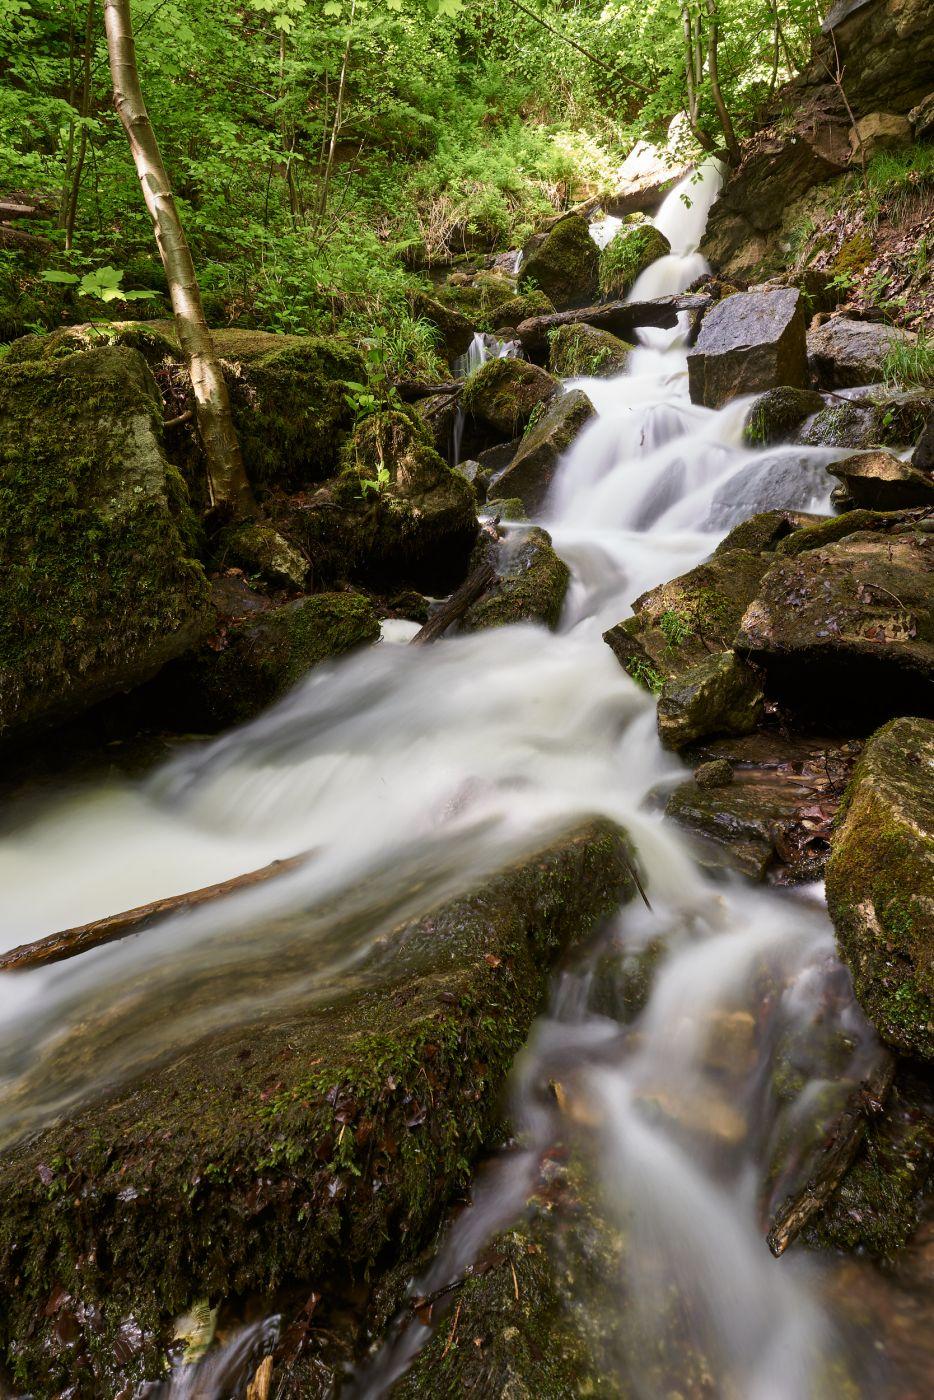 Heslacher Wasserfälle, Germany